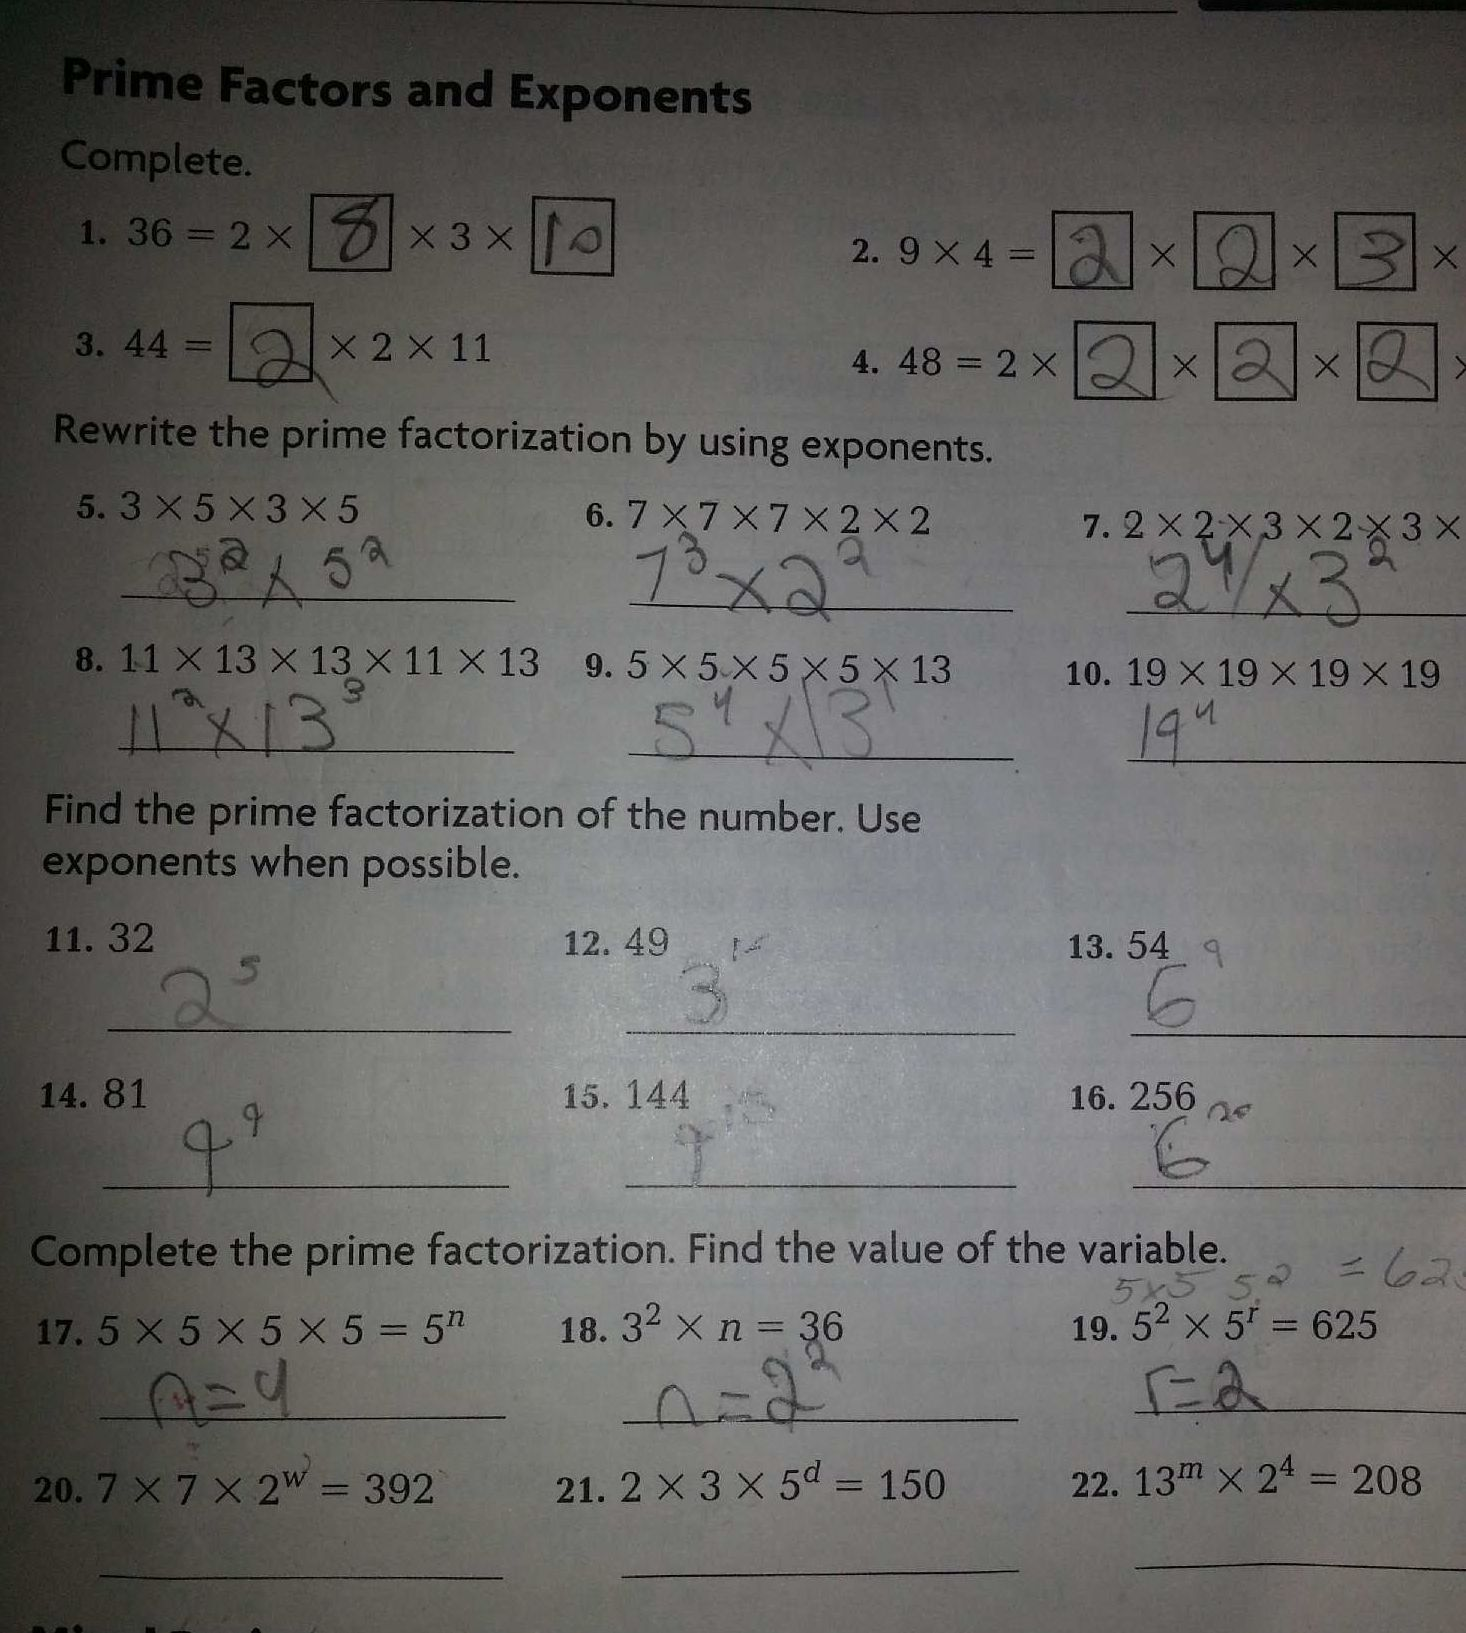 Homework Help Exponents In Word